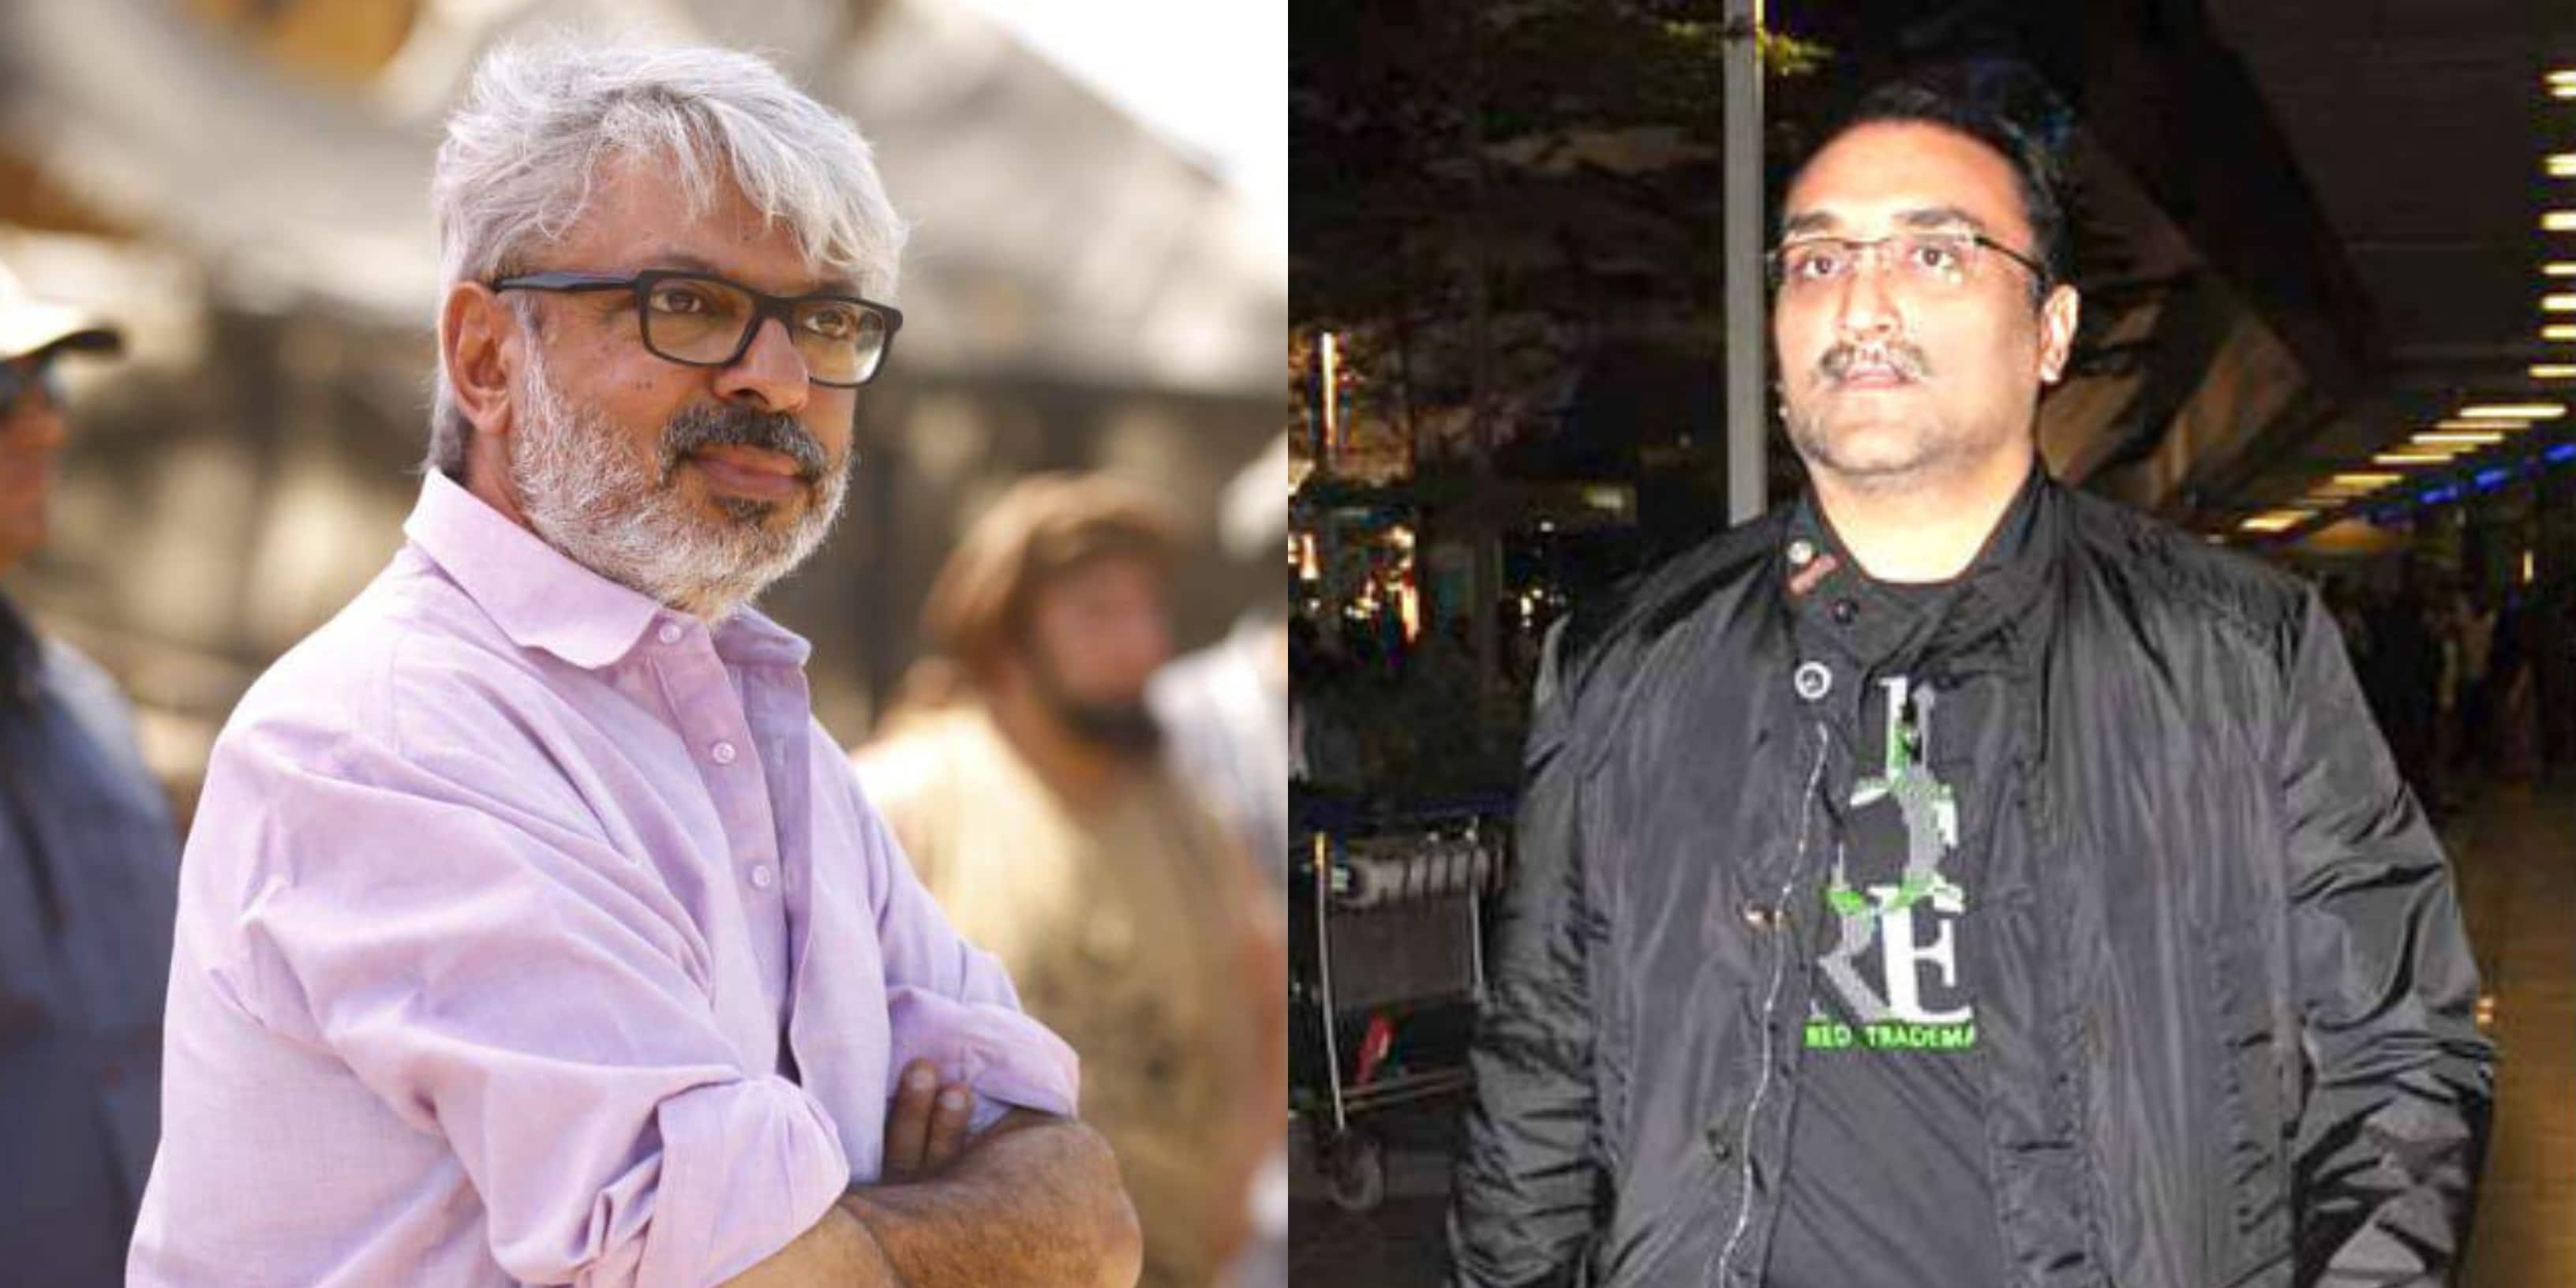 Sushant Singh Rajput Suicide Case: Sanjay Leela Bhansali And Aditya Chopra's Contradicting Statements Cause Further Confusion